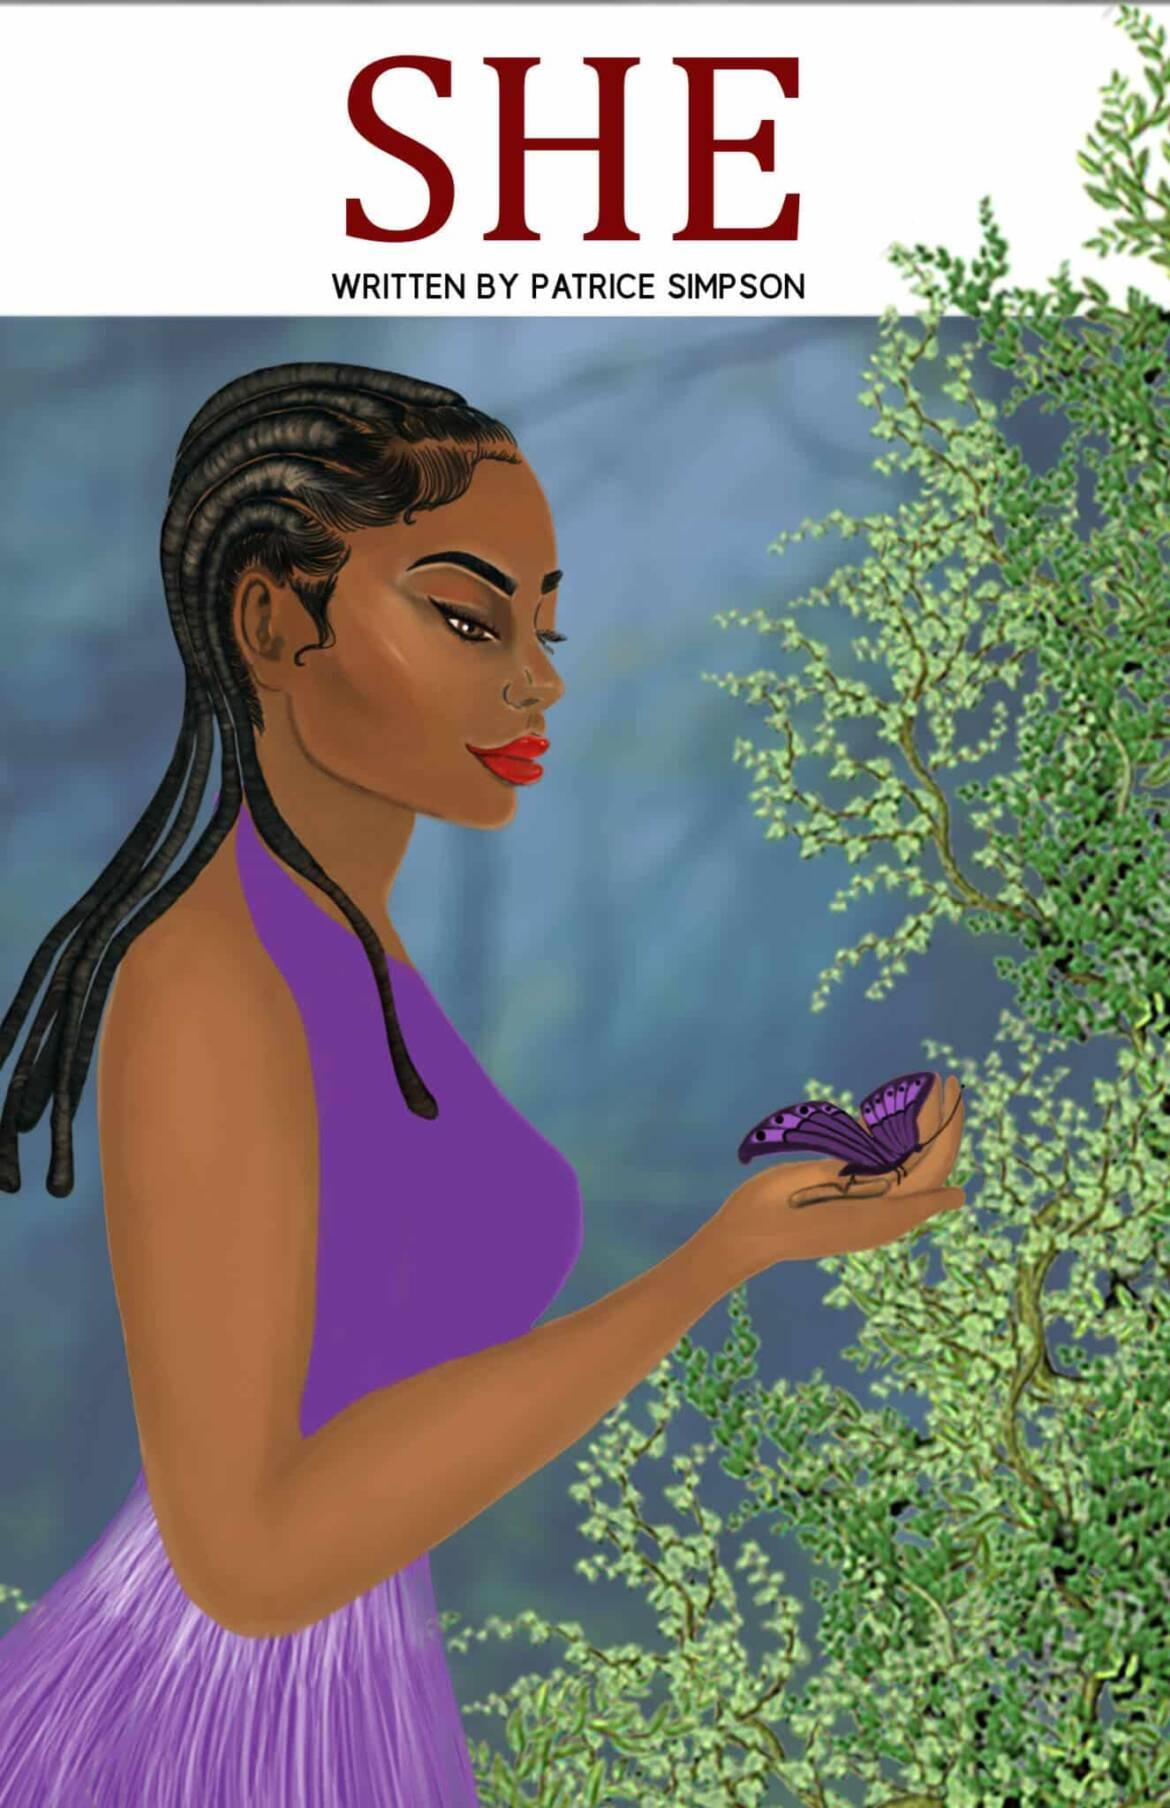 'SHE' Inspires Women Through Depression & Abuse